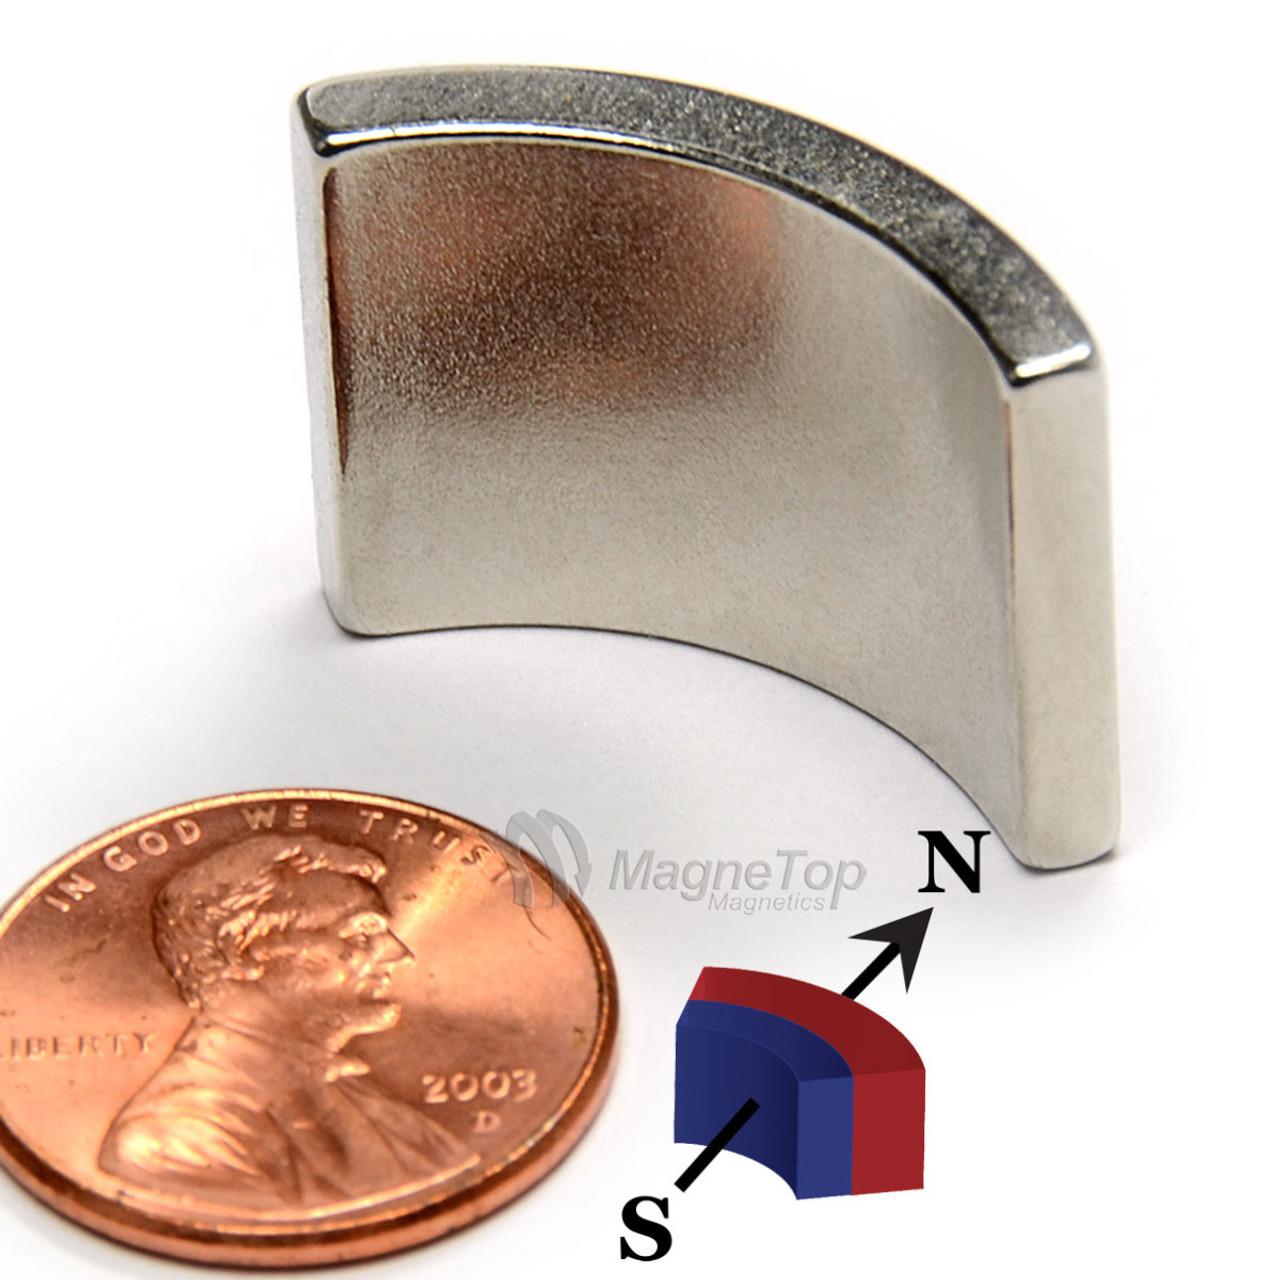 38.1mm (OD) x 31.75mm(ID) x 19mm 90 Degree -N42HT-S Pole Neodymium Arc